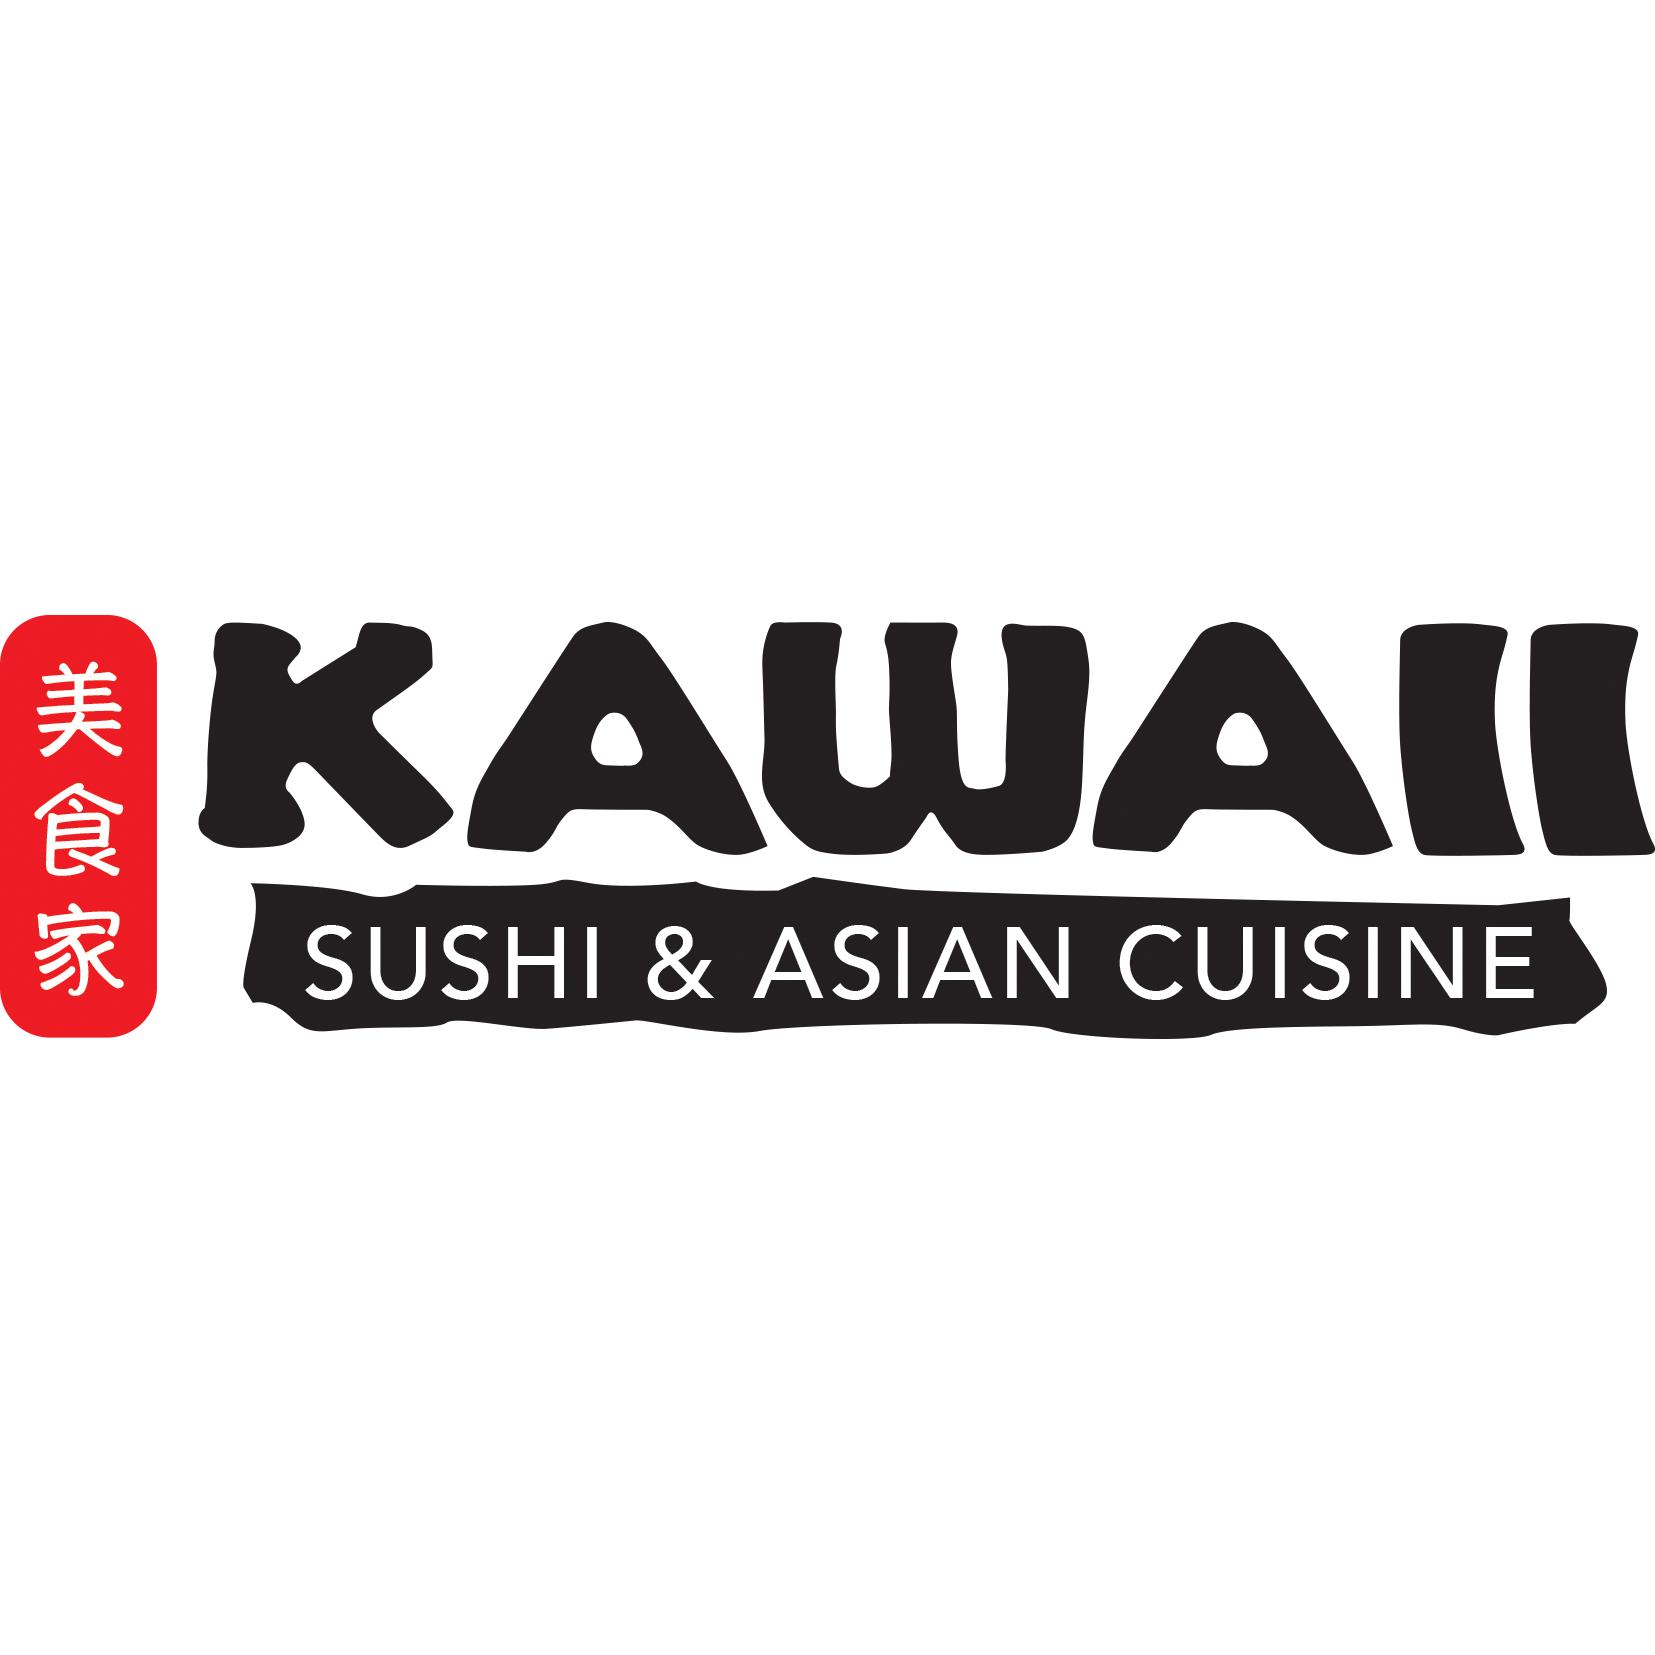 Kawaii Sushi and Asian Cuisine